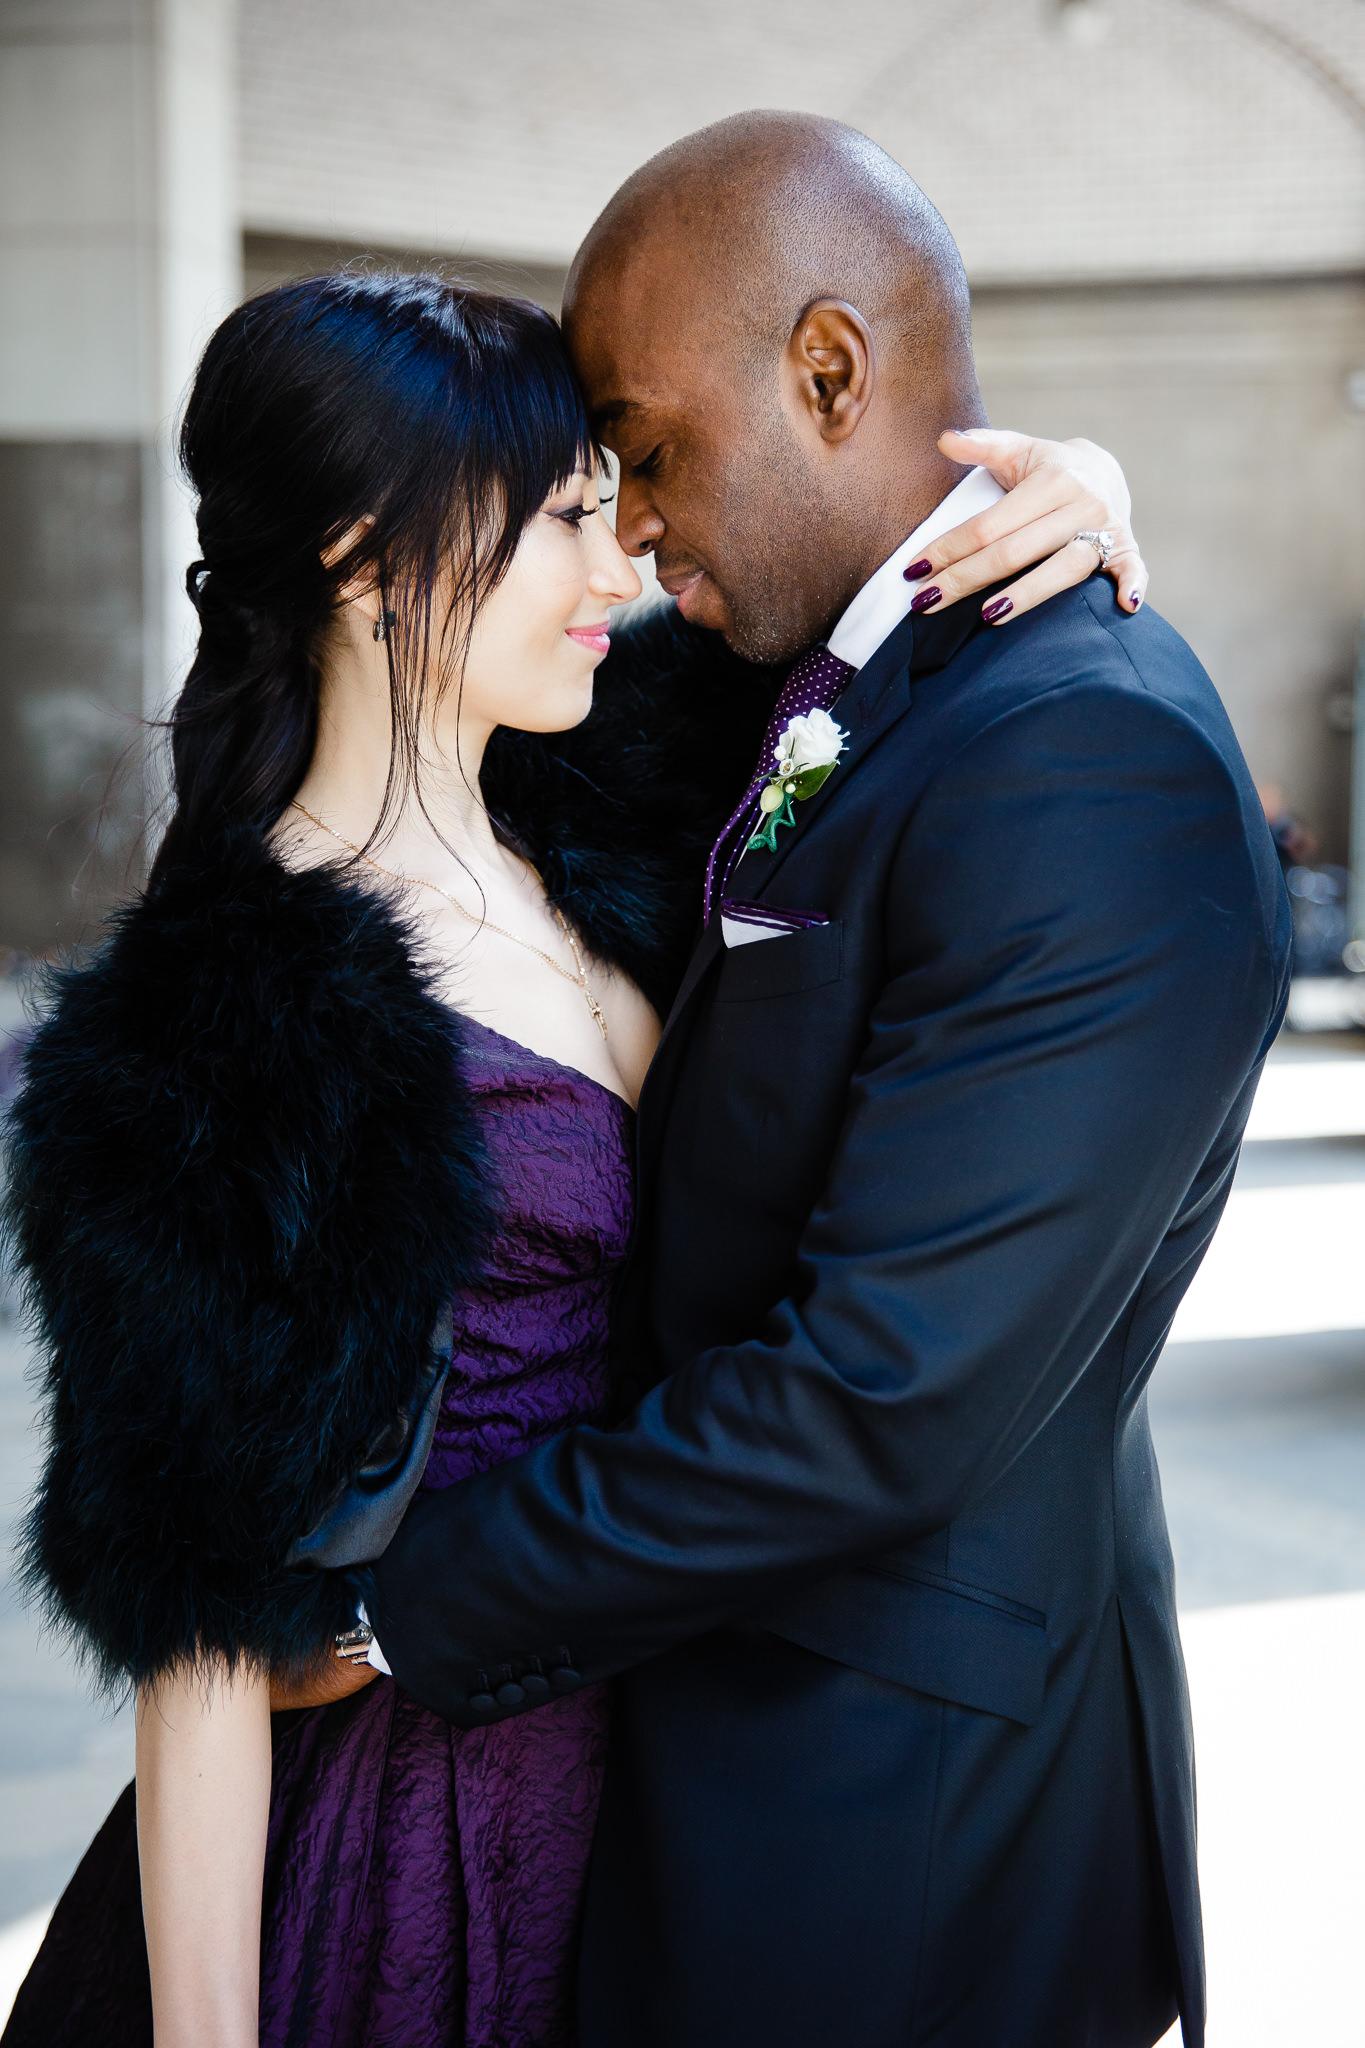 new-york-city-wedding-photographer-brooklyn-wedding-photographer-long-island-wedding-photographer-hudson-valley-wedding-photographer-new york city elopement photographer